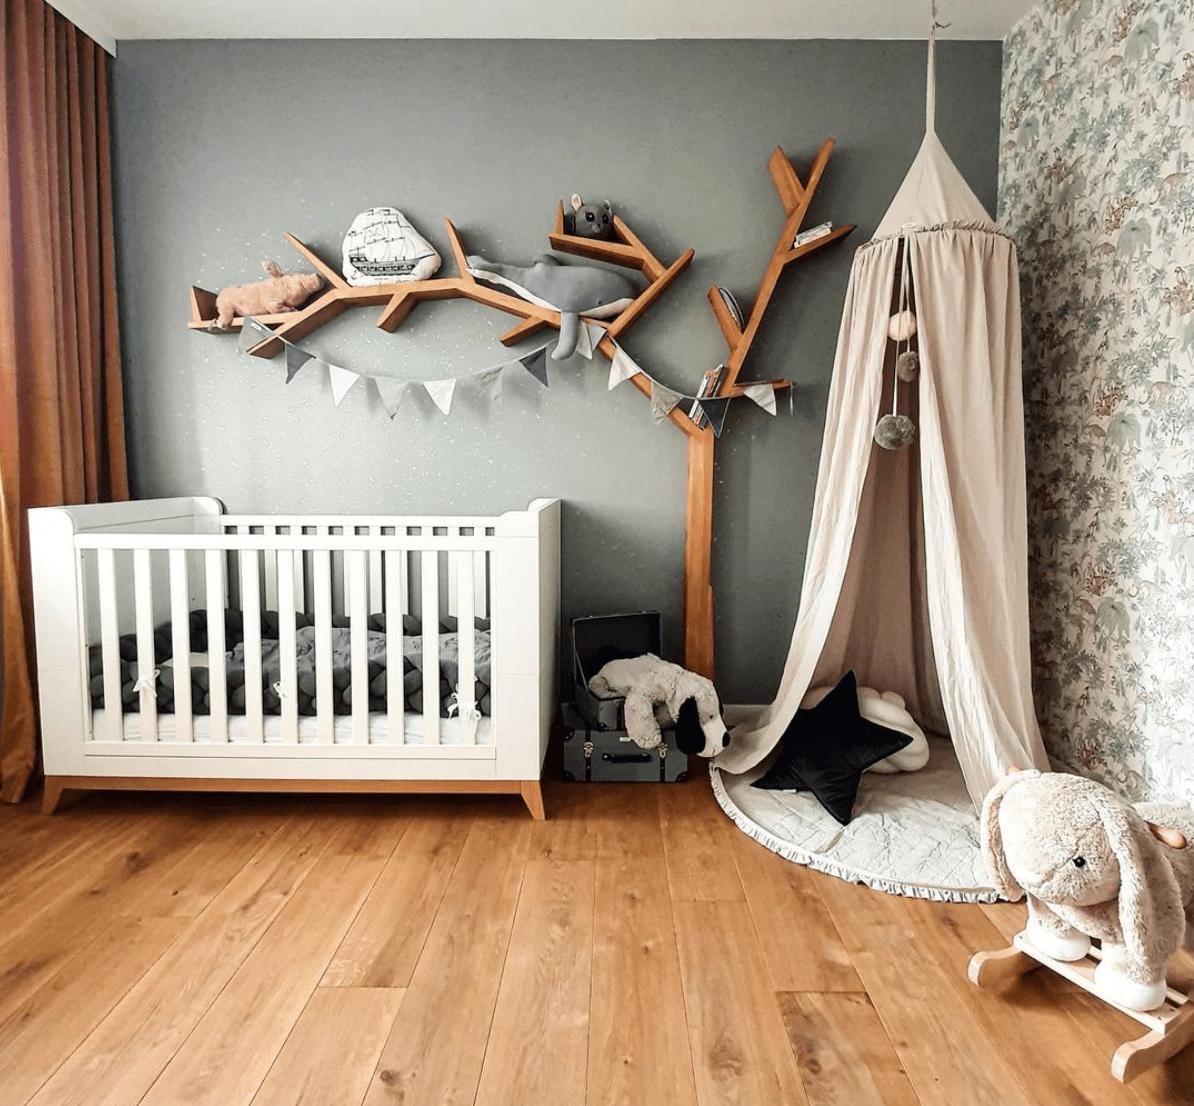 A large, tree-shaped shelf in a nursery.